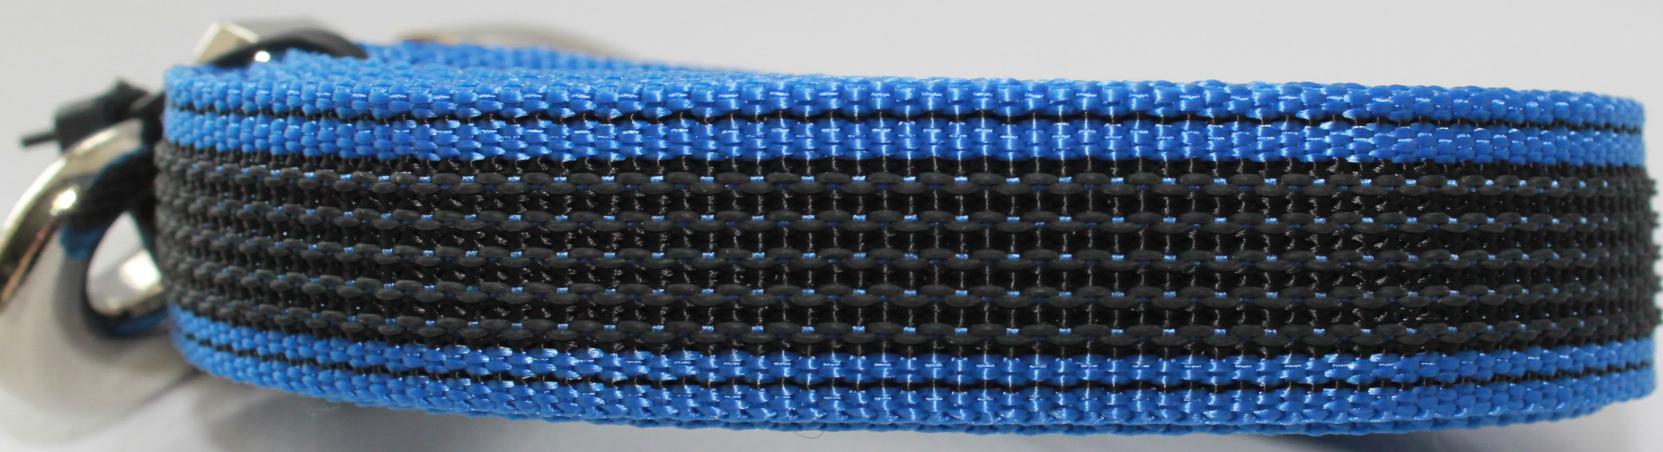 Поводок для собак Happy Friends, нескользящий, цвет: синий, ширина 2 см, длина 1,20 м поводок водилка для собак happy friends нескользящий цвет синий ширина 2 см длина 0 40 м